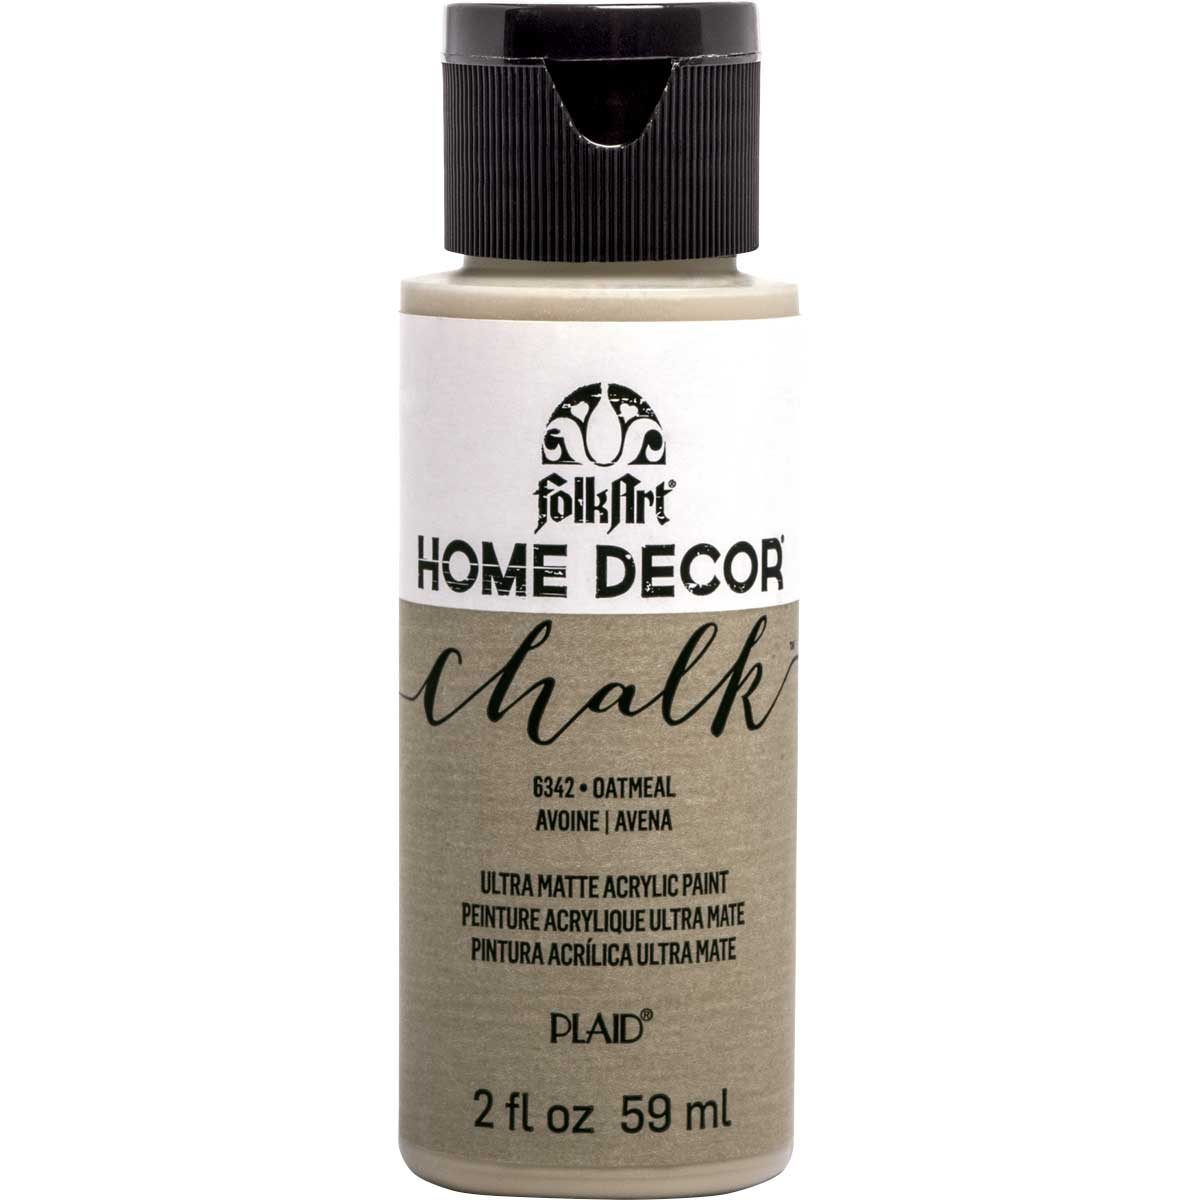 FolkArt ® Home Decor™ Chalk - Oatmeal, 2 oz.